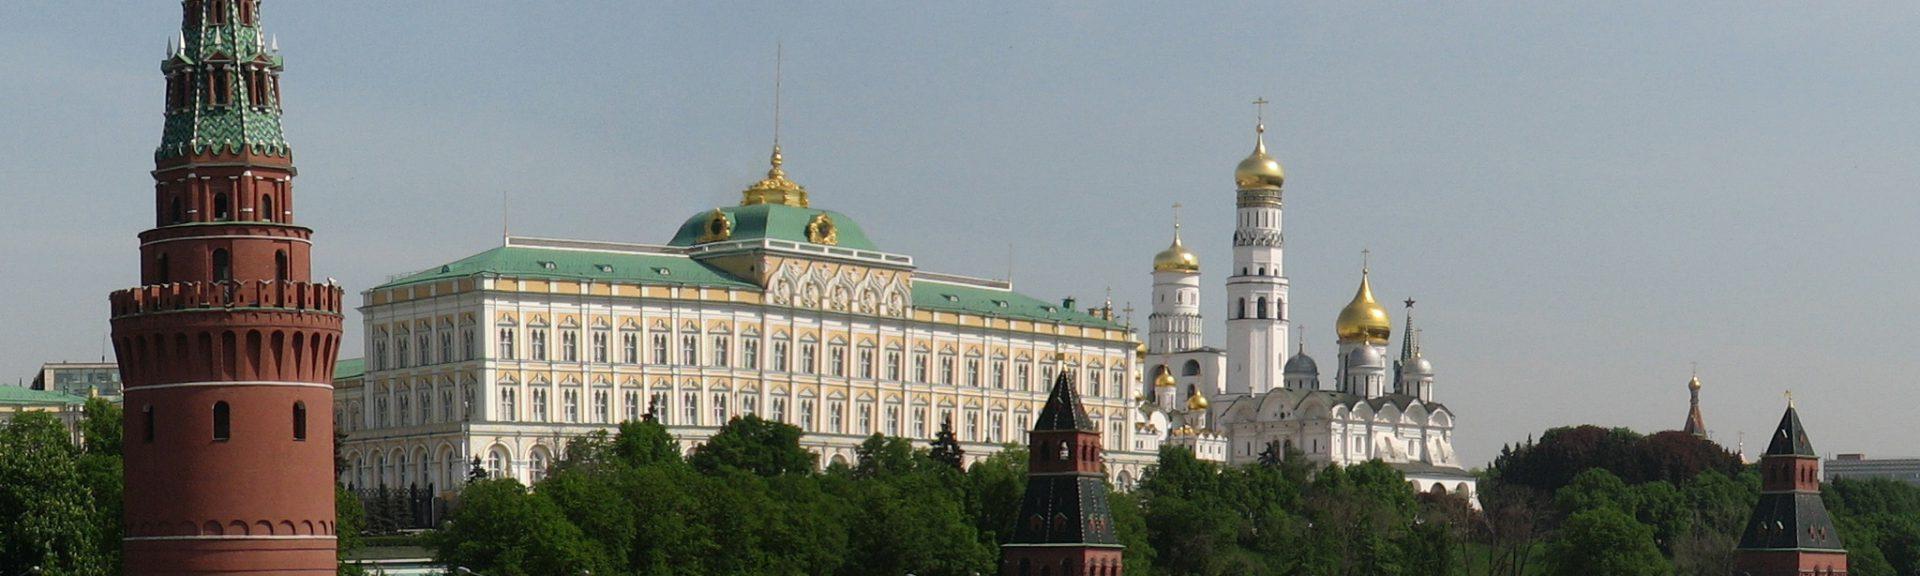 https://commons.wikimedia.org/wiki/File:Moscow_Kremlin_from_Kamenny_bridge.jpg